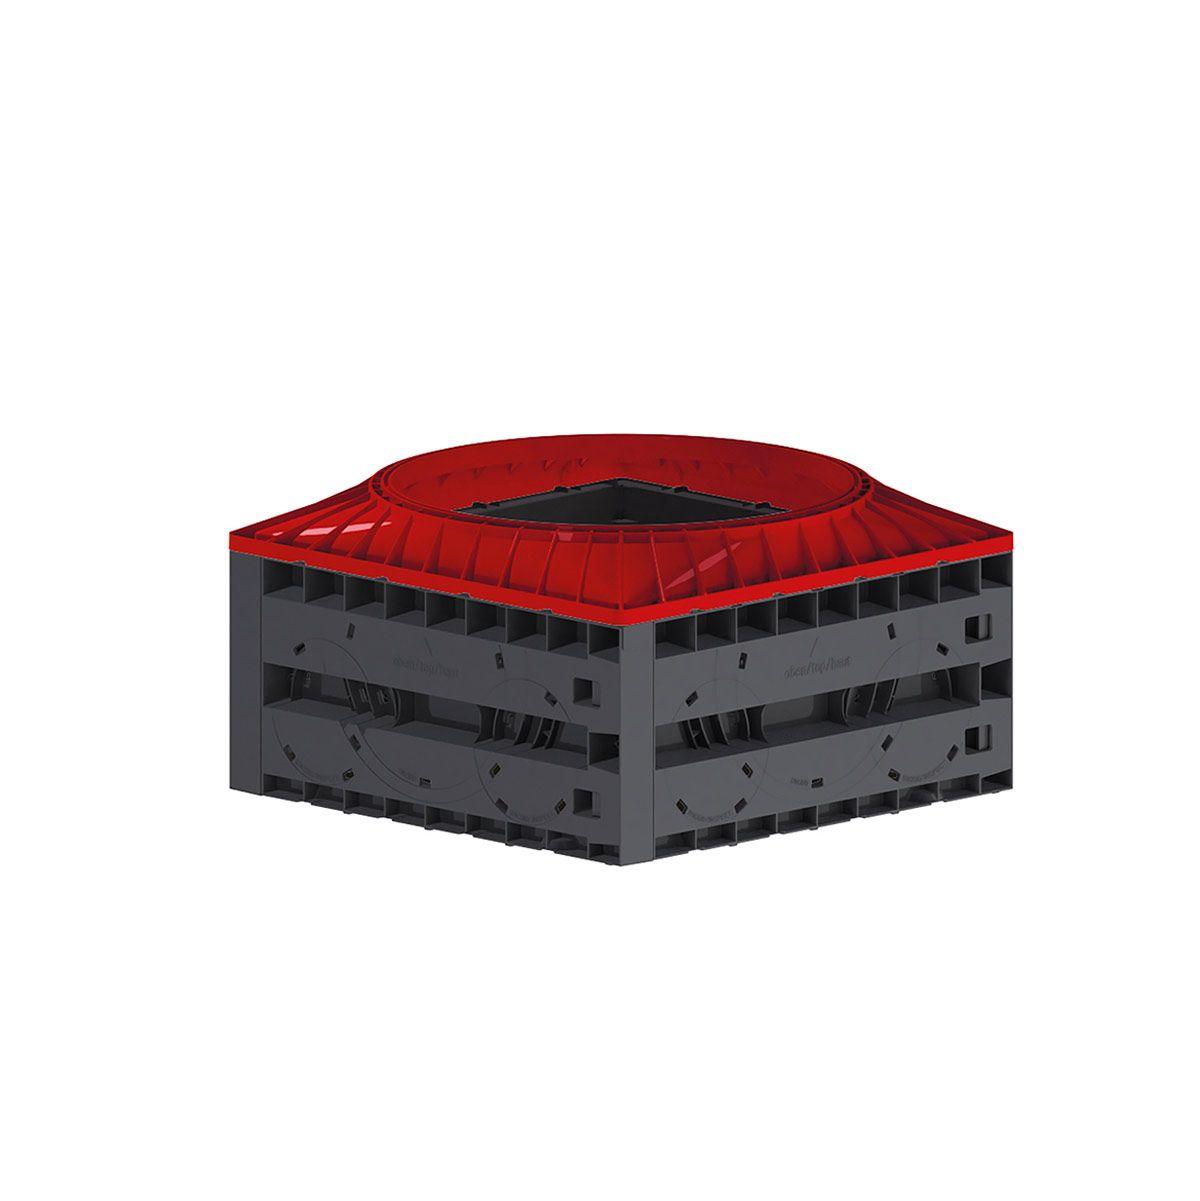 Schachtsystem Vario 800, 1.0 Lagen